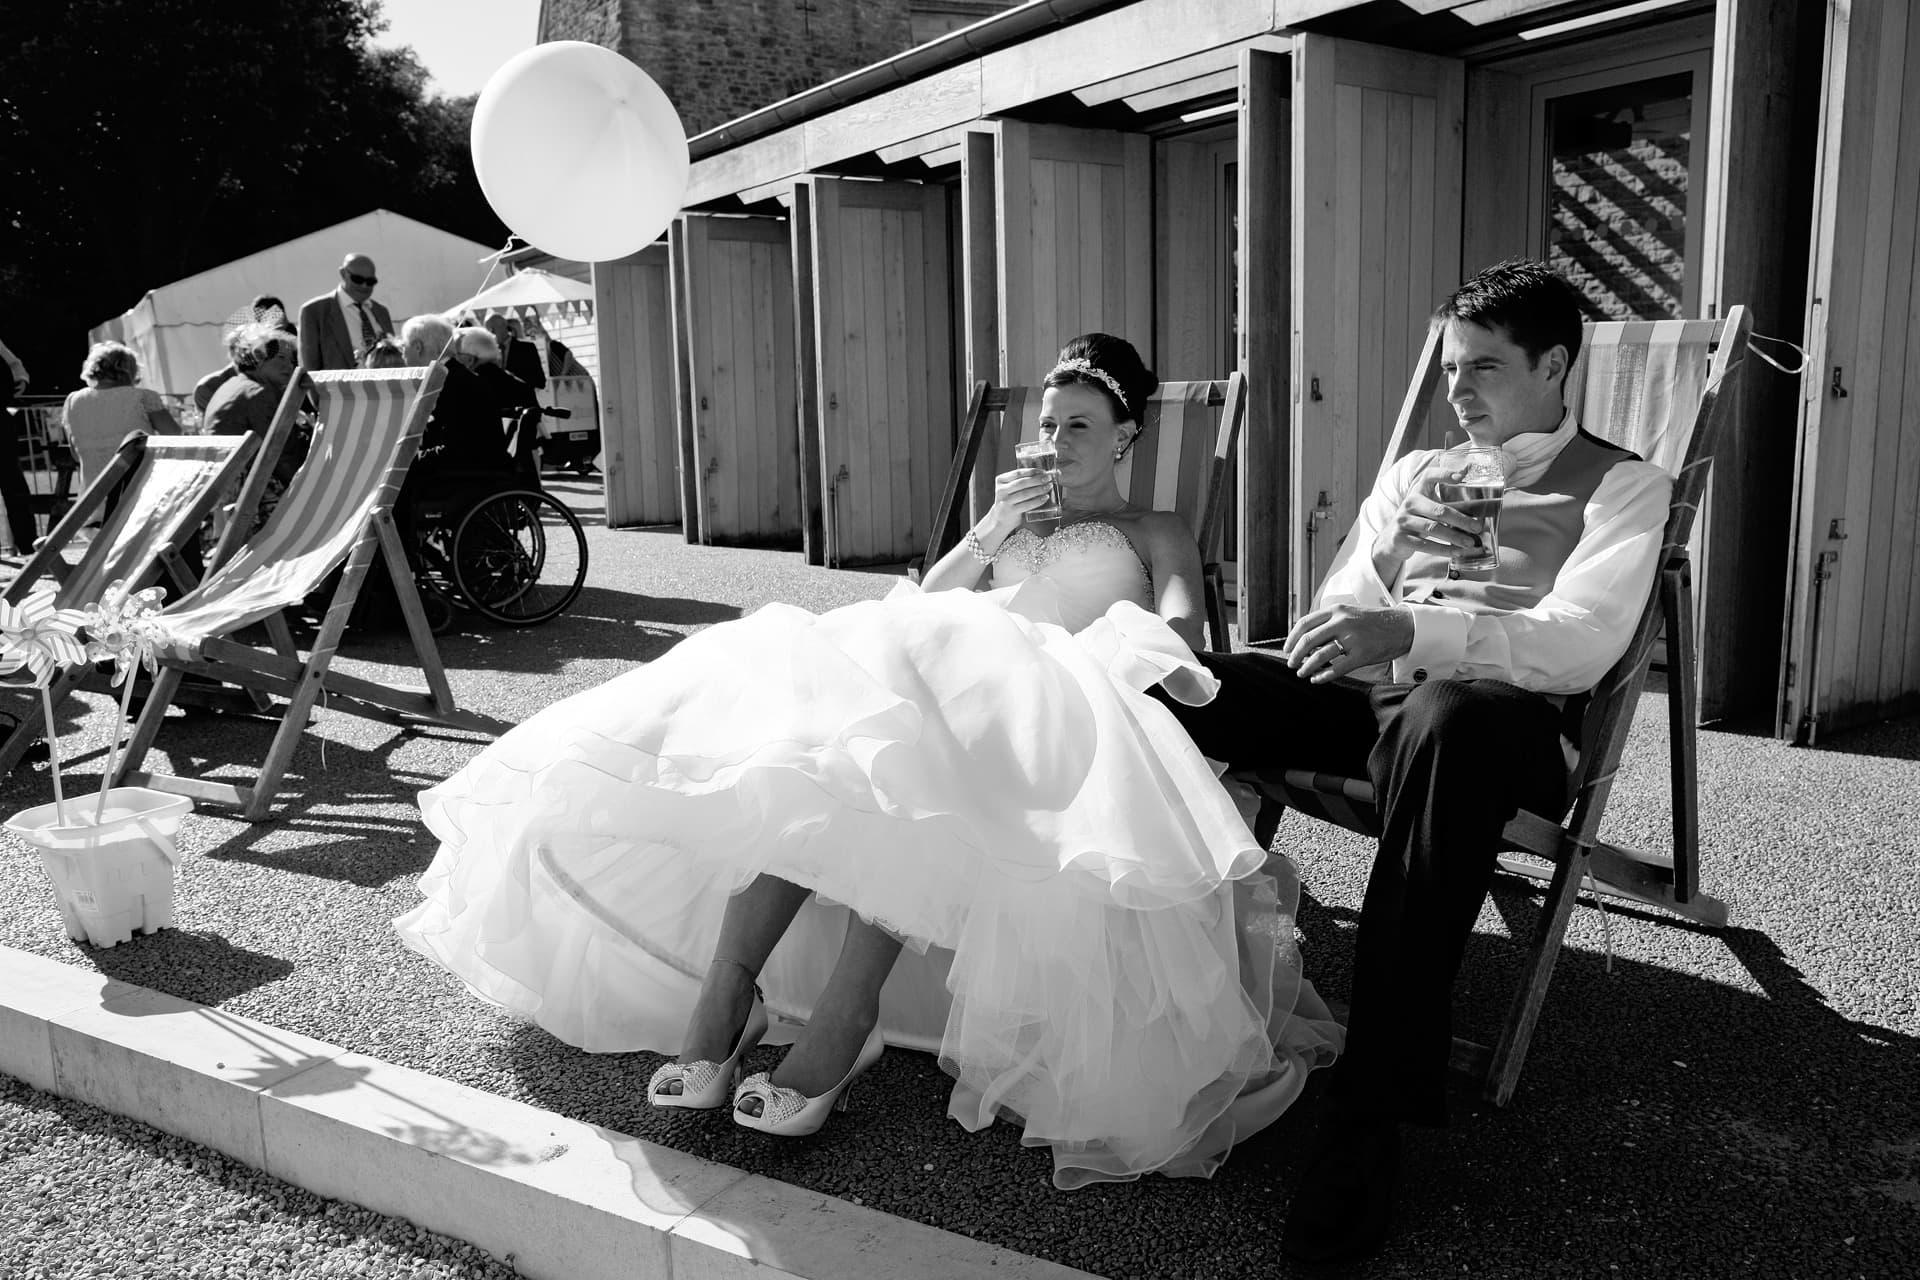 Dorset-weddings-beach-deckchairs